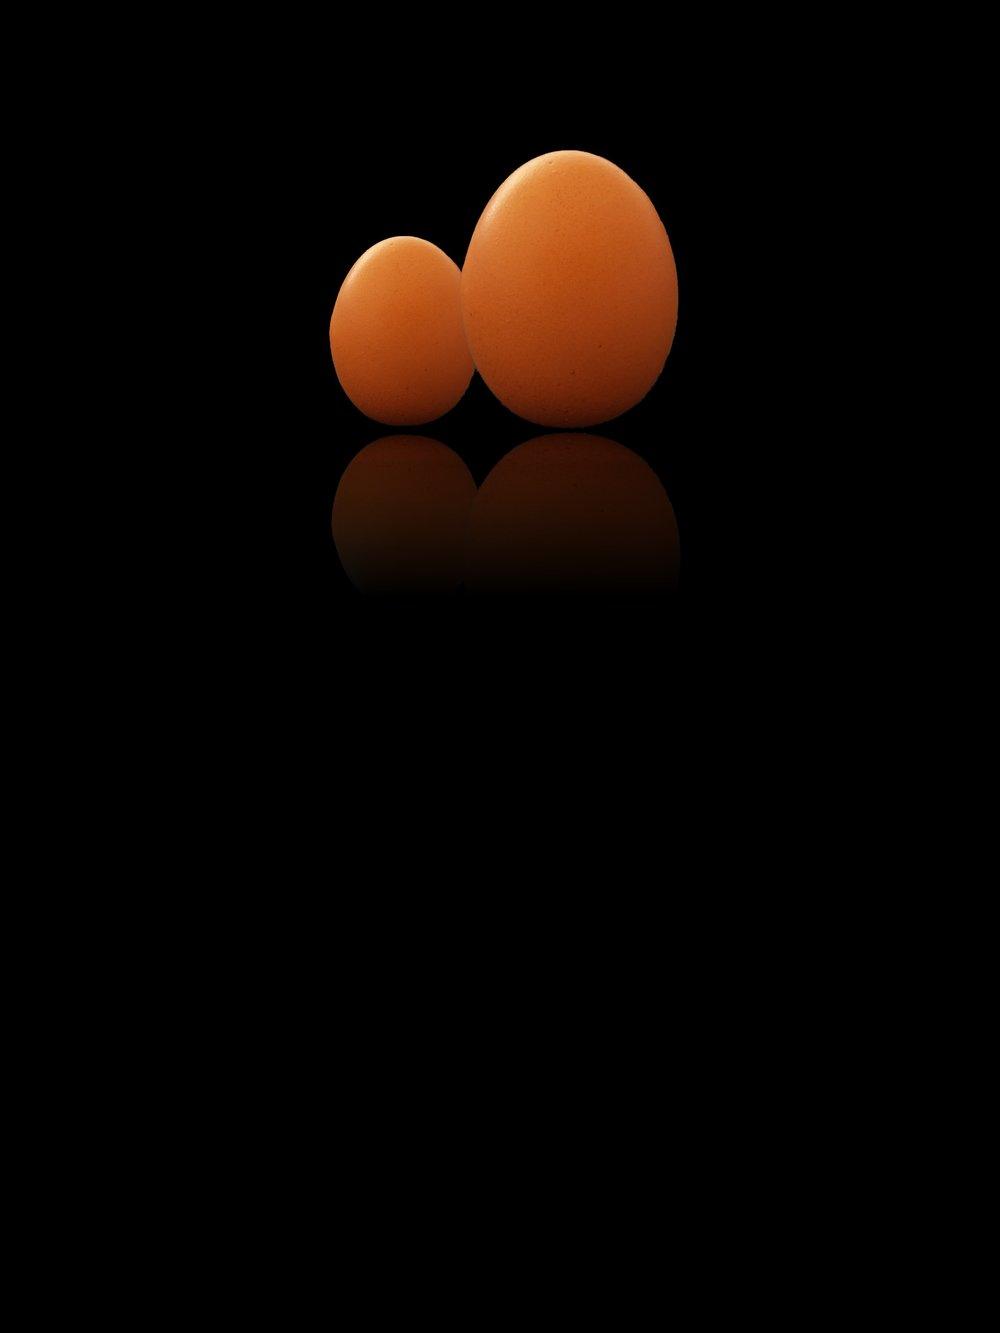 huevos 002.jpg